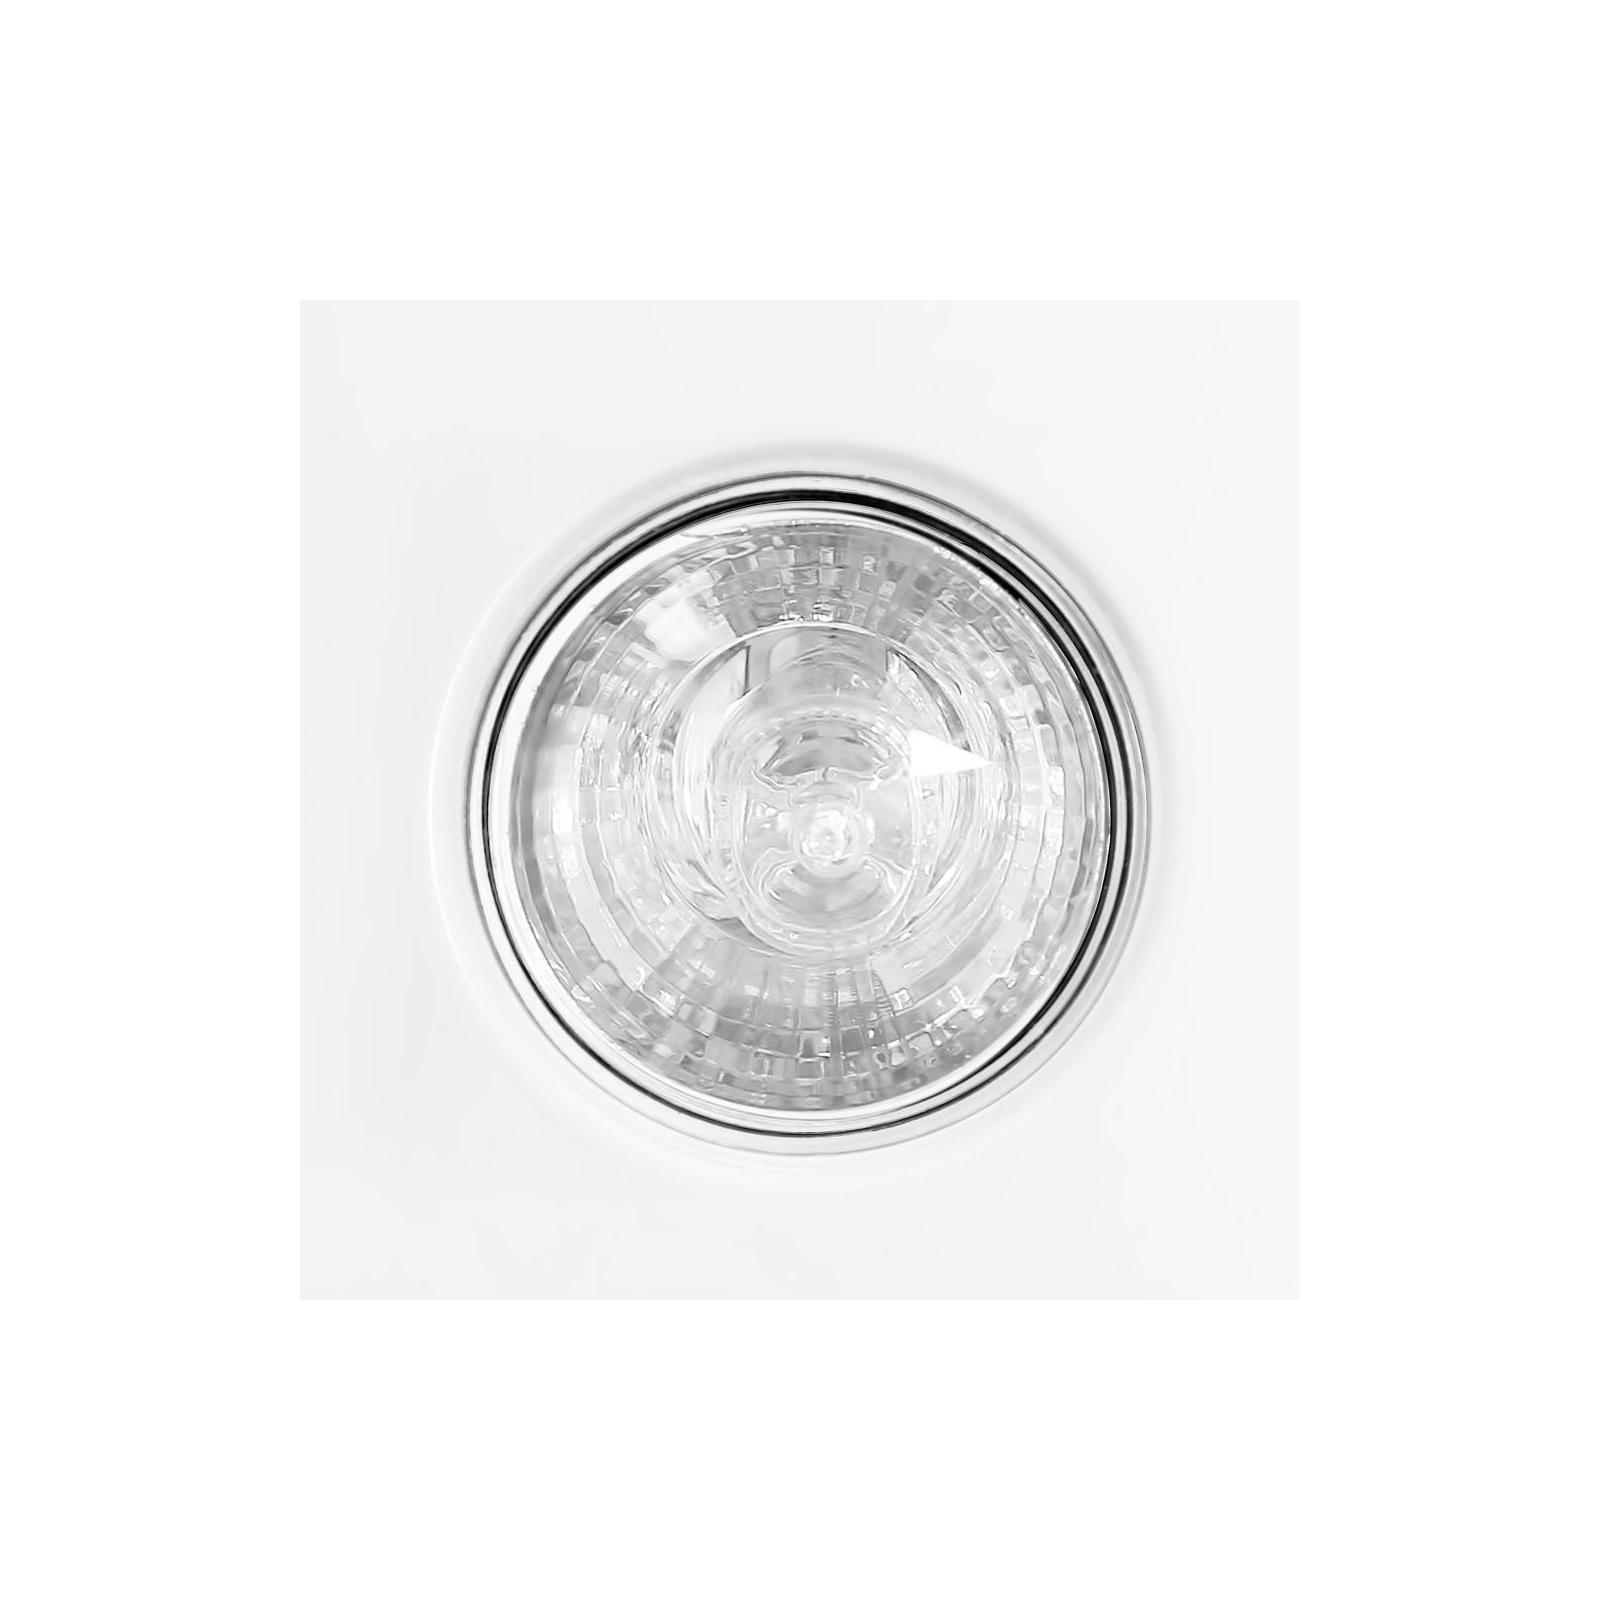 Вытяжка кухонная PERFELLI TL 5611 A 1000 W изображение 7